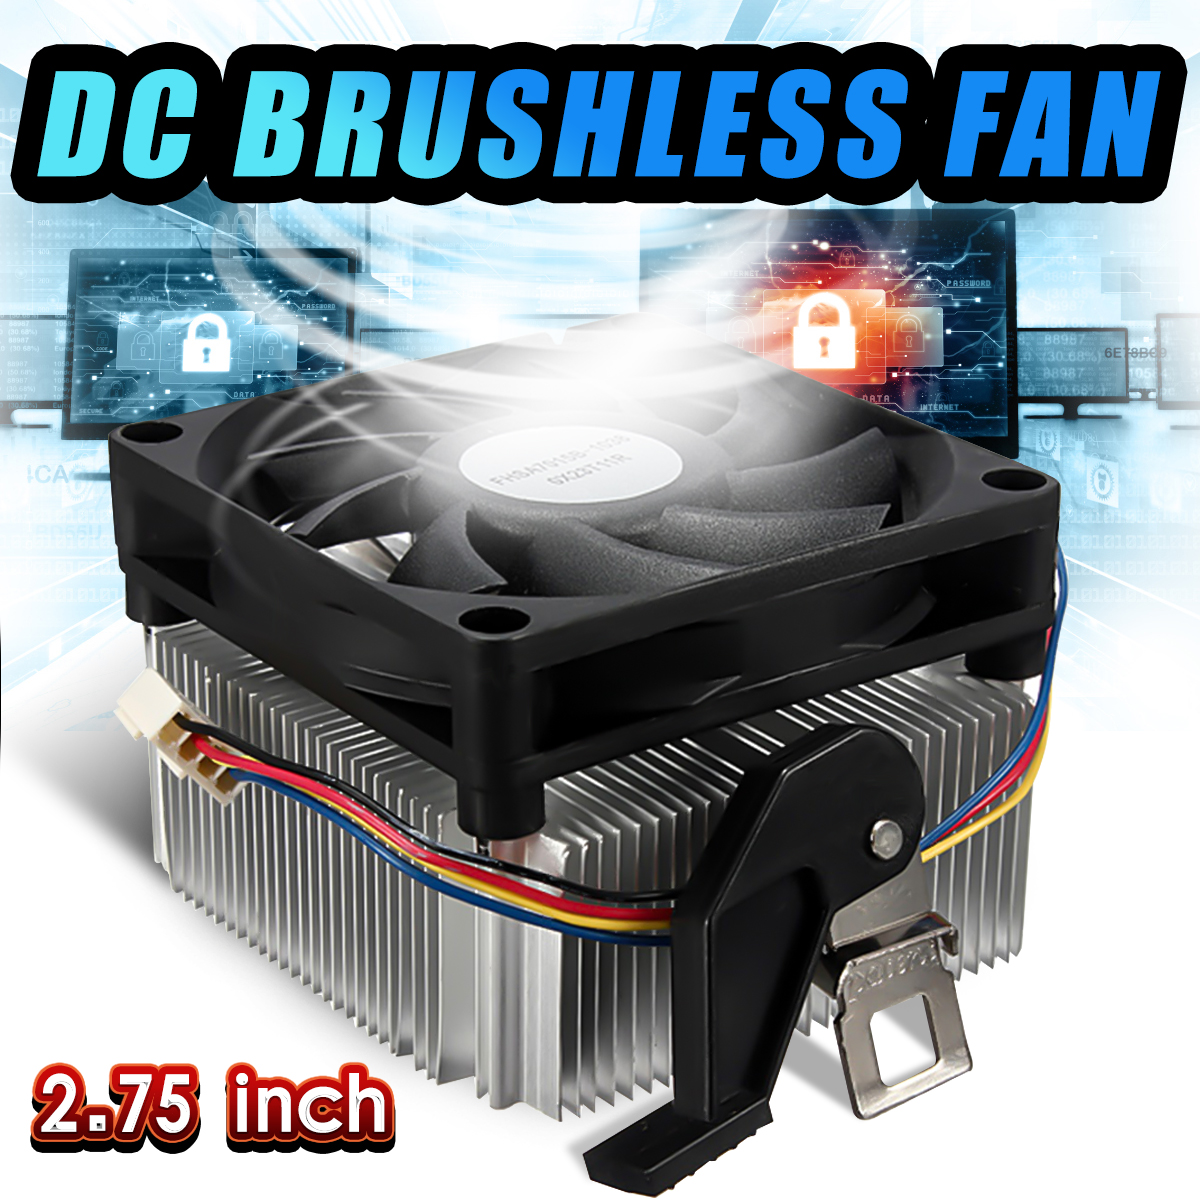 A3 CPU Cooling Fan Heatsink Radiator Cooler for AMD754 939 940 AMD Athlon64 YB